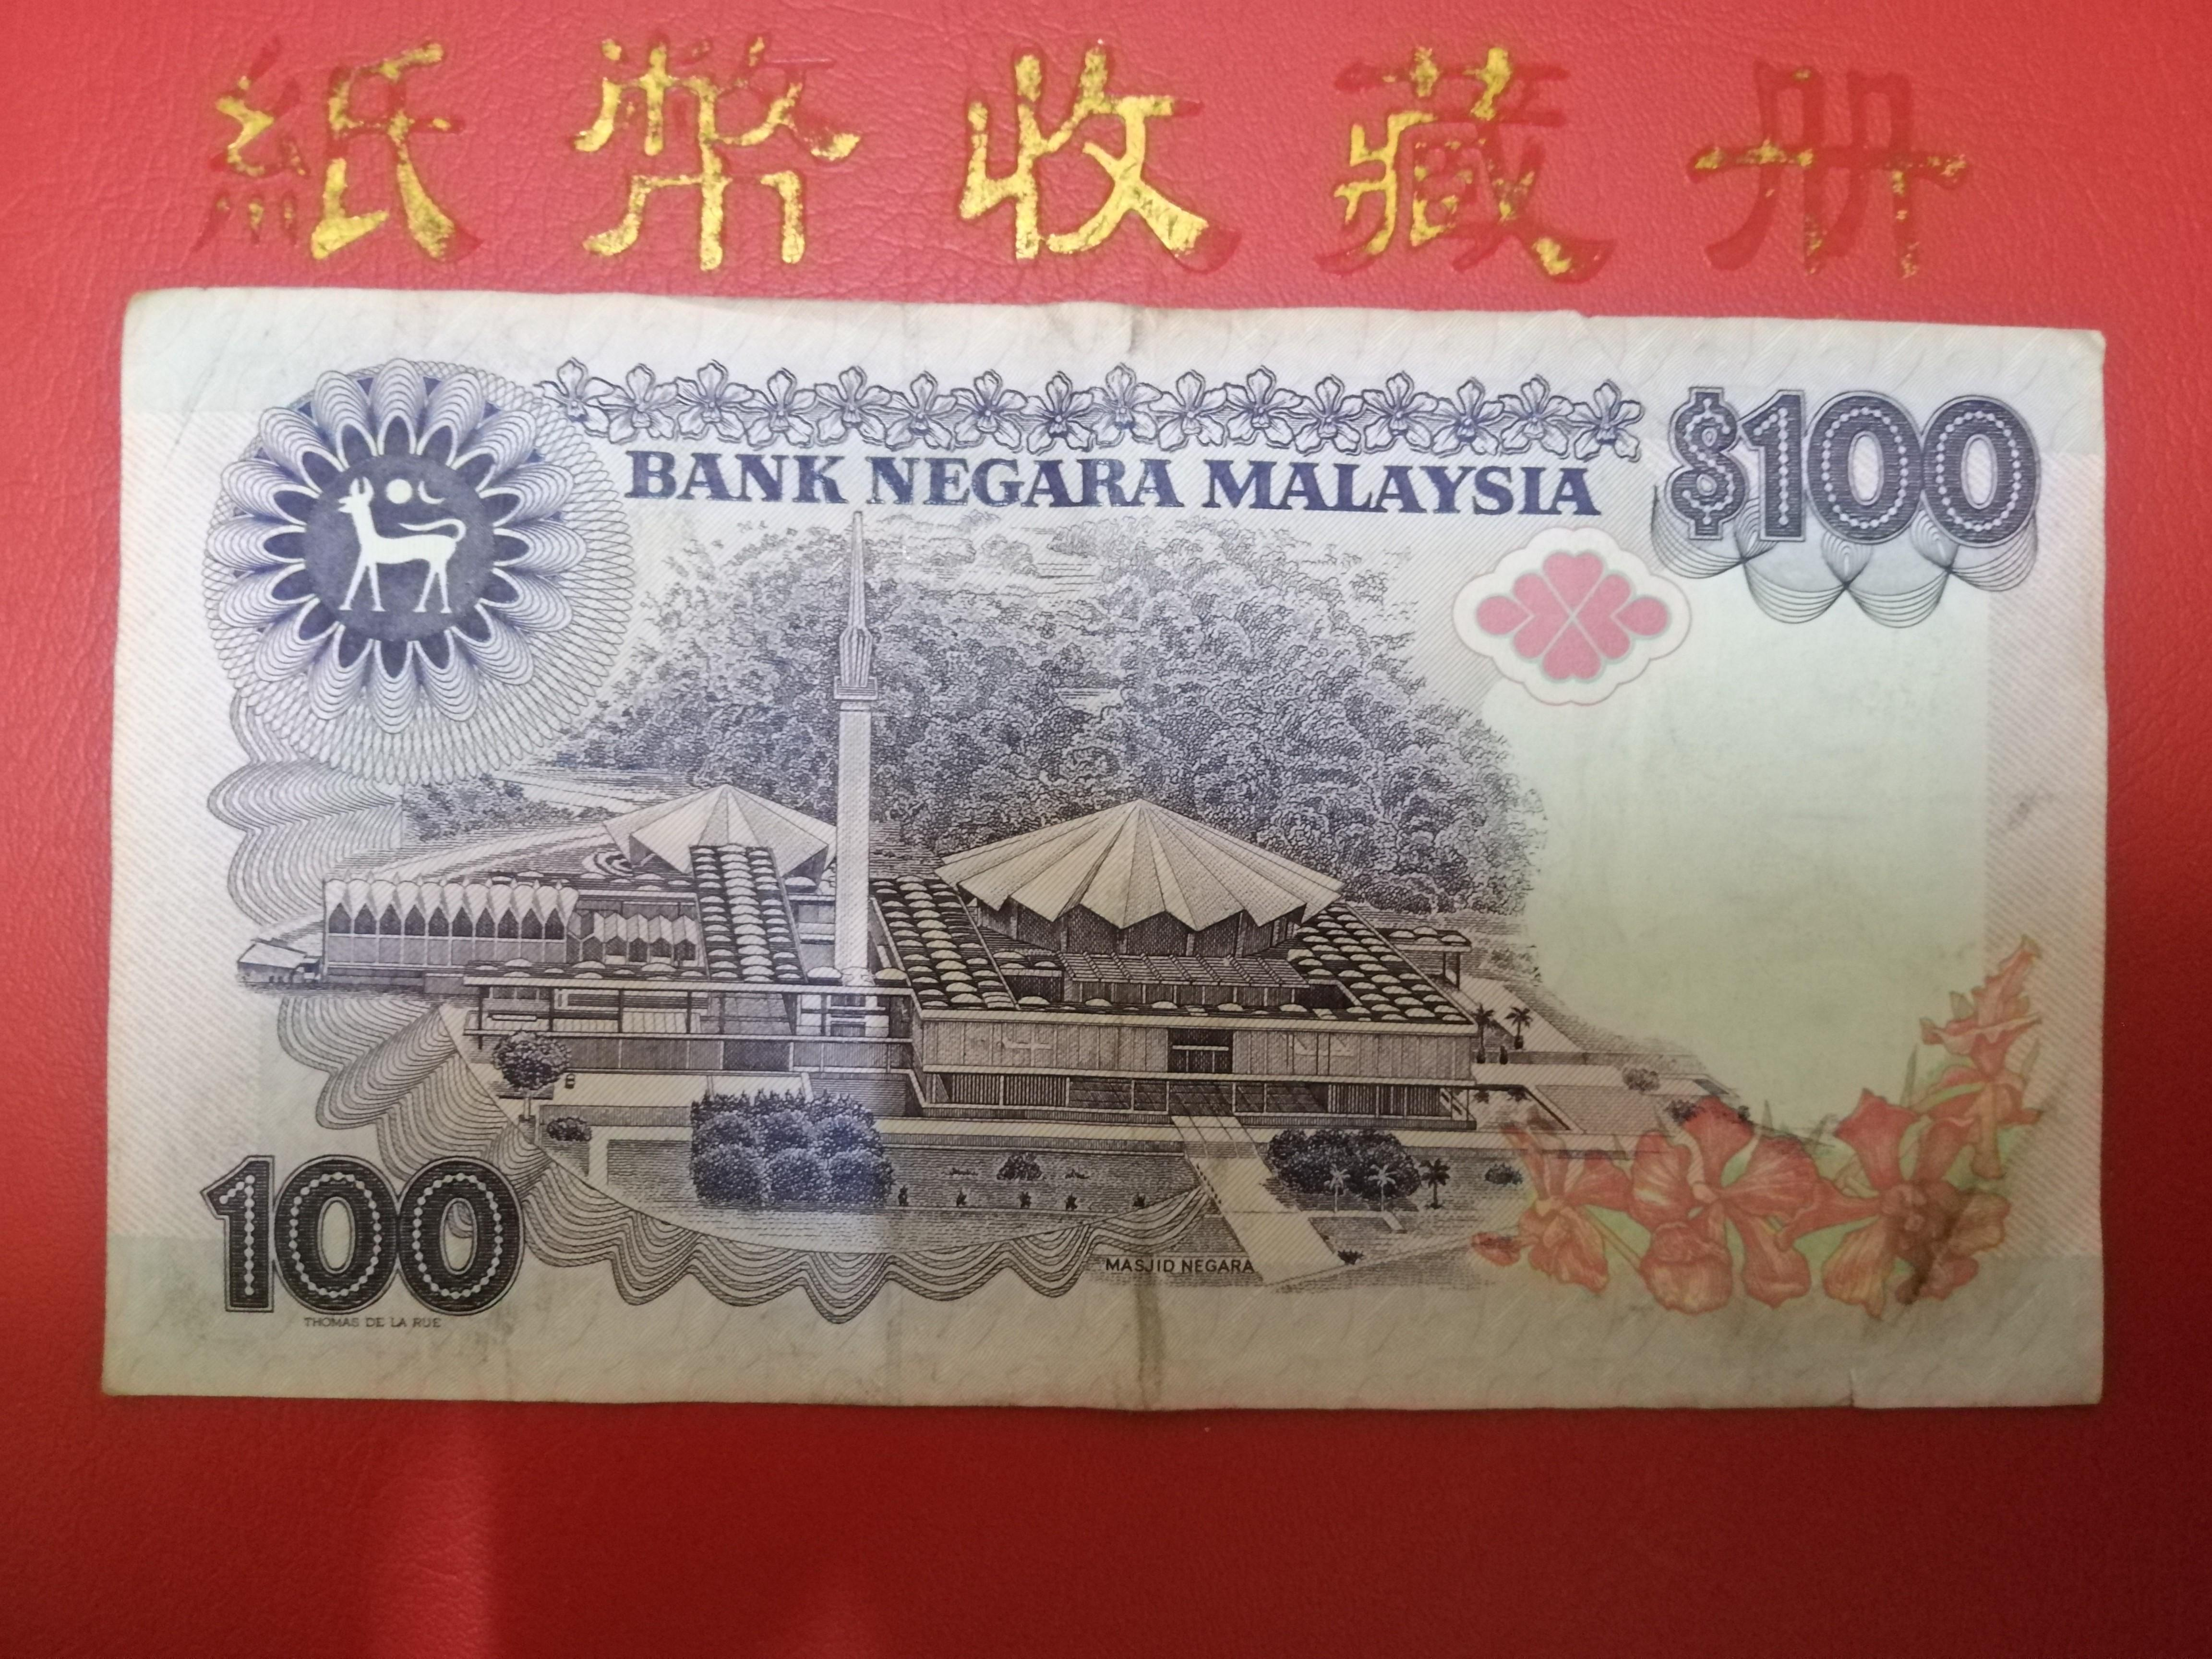 RM100 7th series - AJ 9853726 (F)